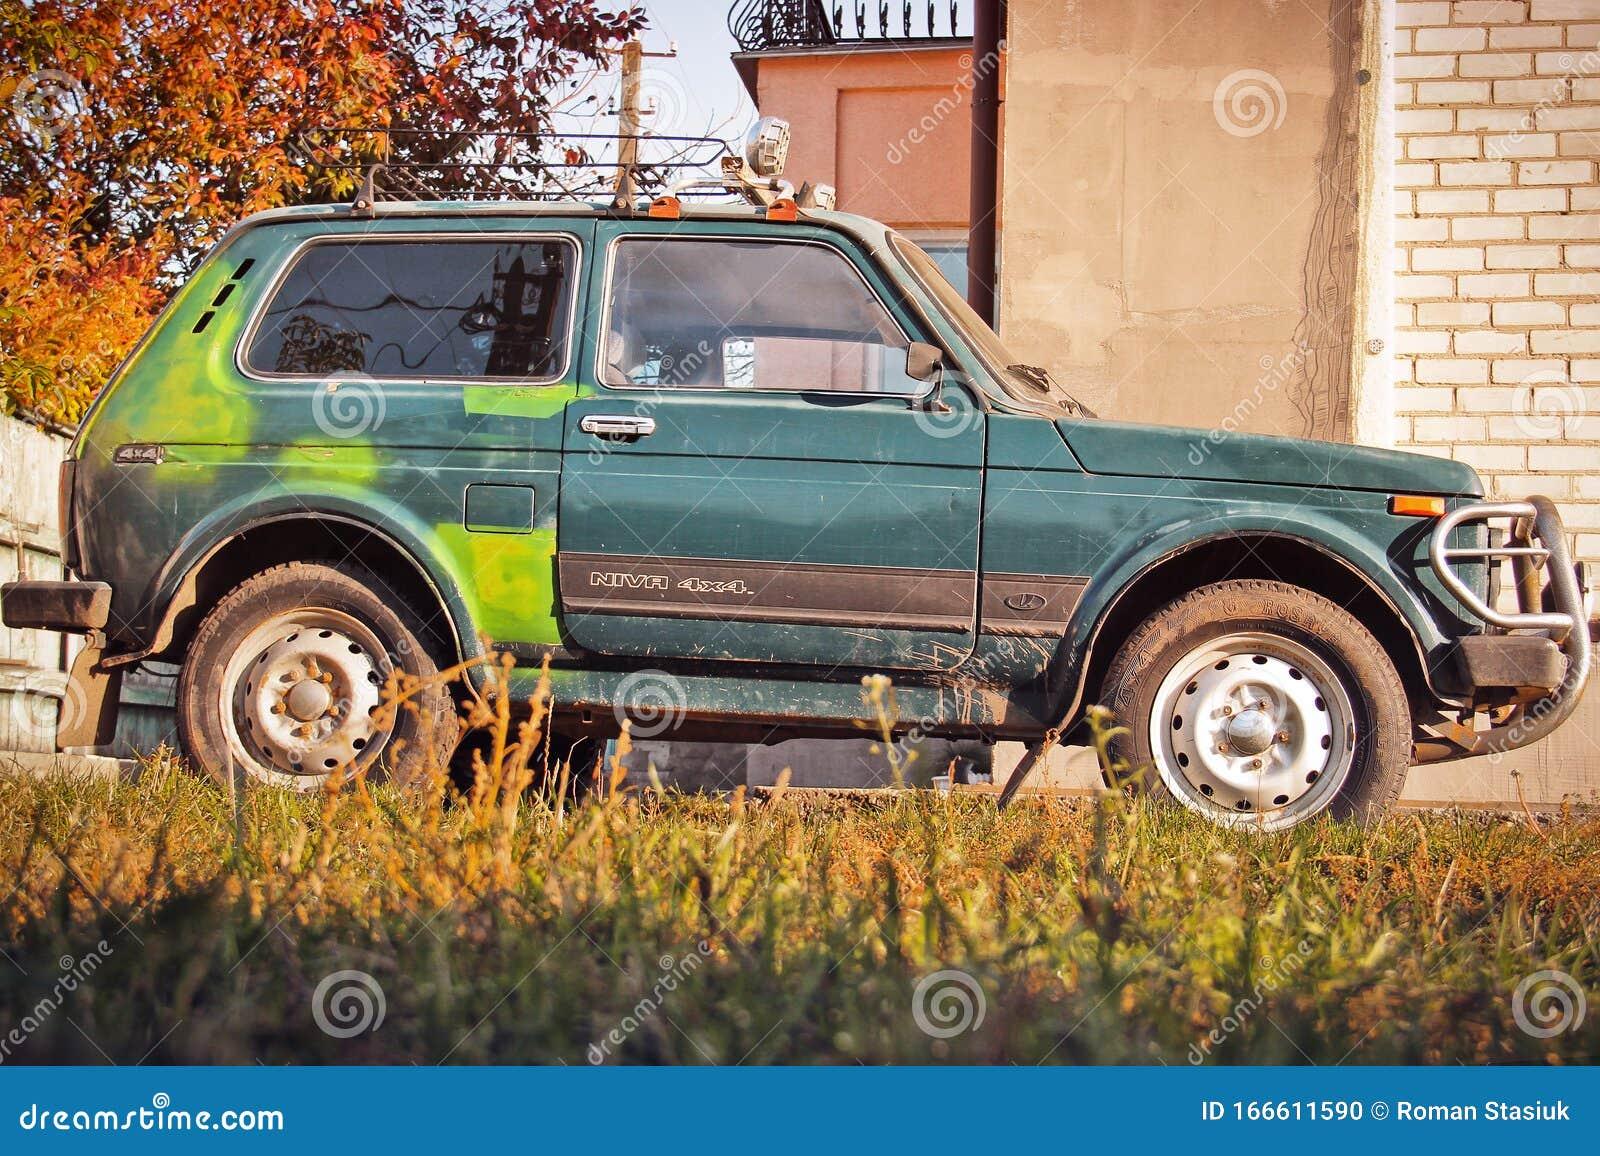 Chernihiv Ukraine October 15 2019 Suv Lada Niva 4x4 In The Yard Editorial Image Image Of Luxury Metallic 166611590